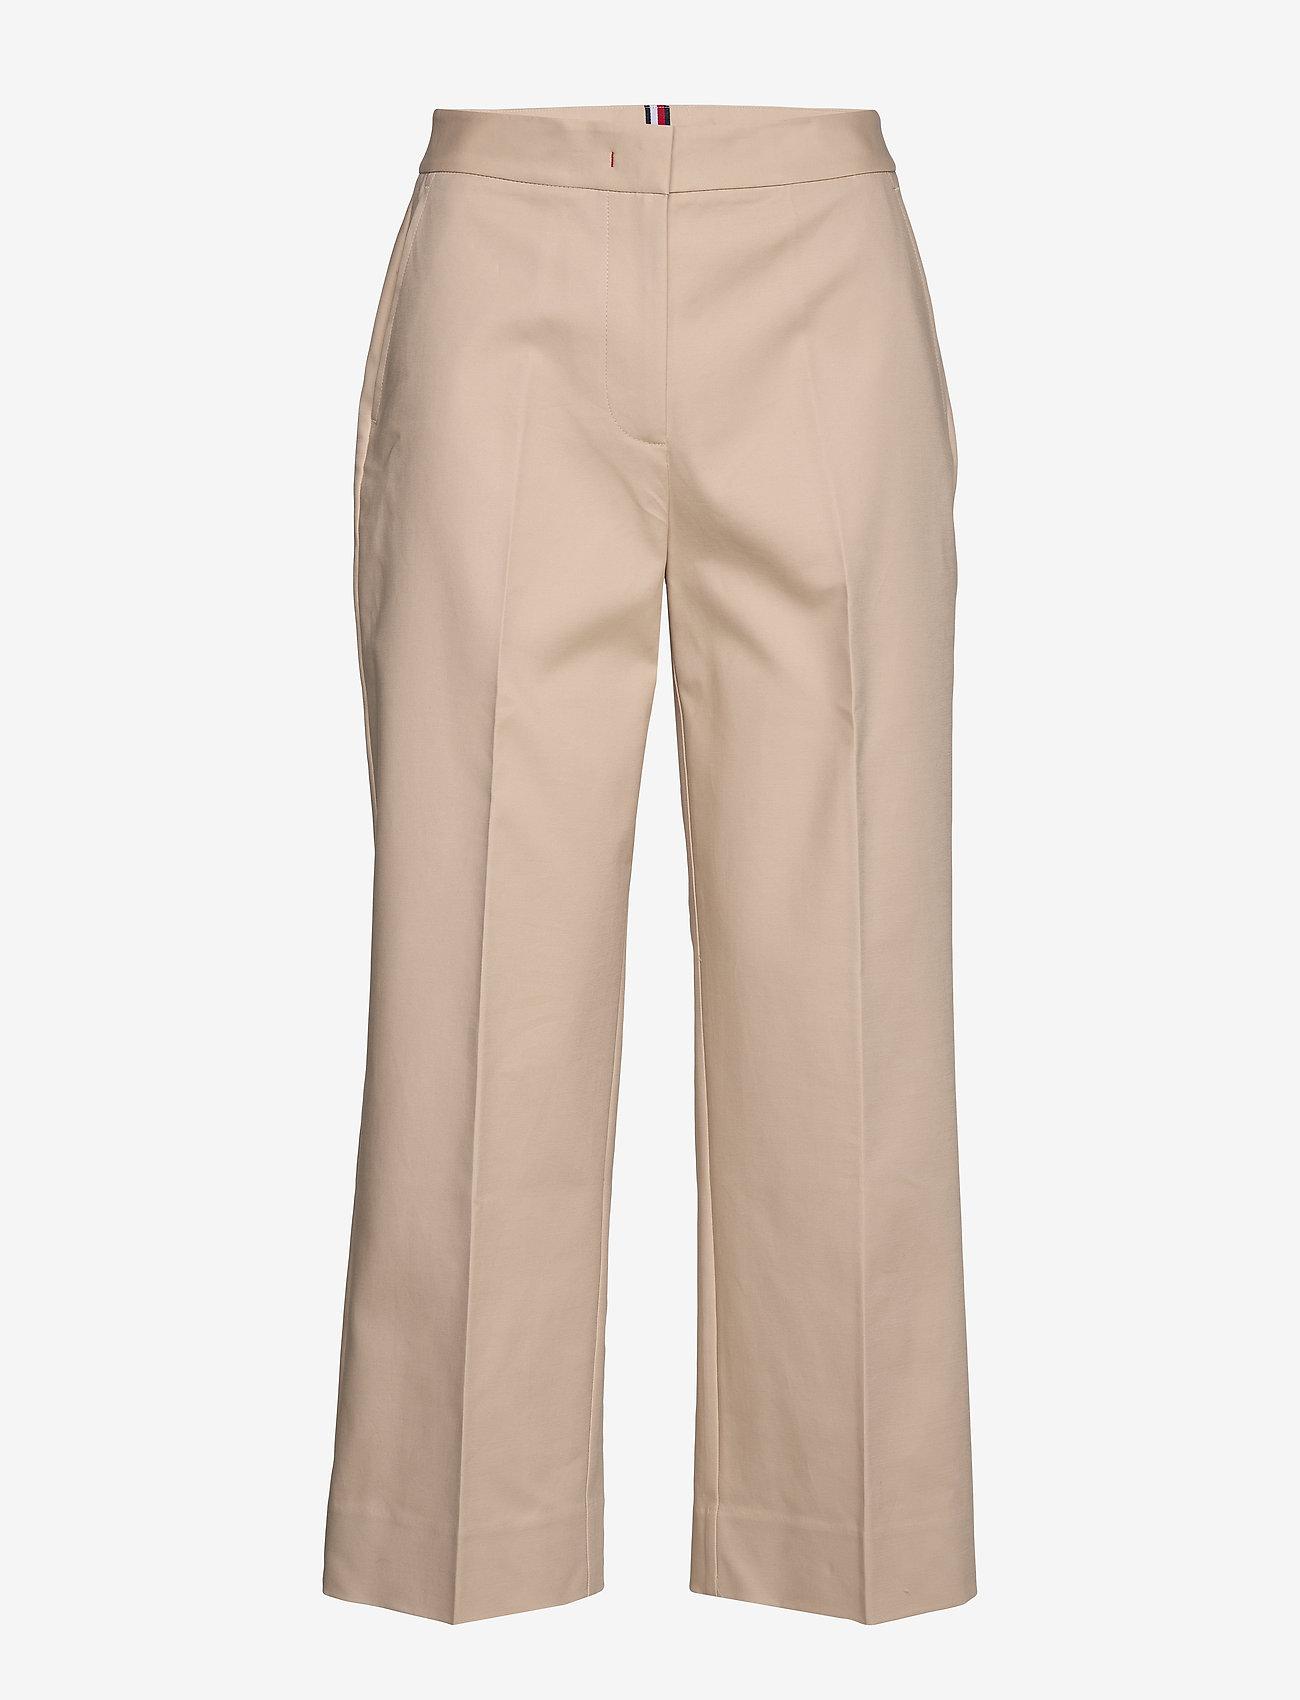 Tommy Hilfiger - SLUB COTTON CULOTTE PANT - straight leg trousers - sahara tan - 0